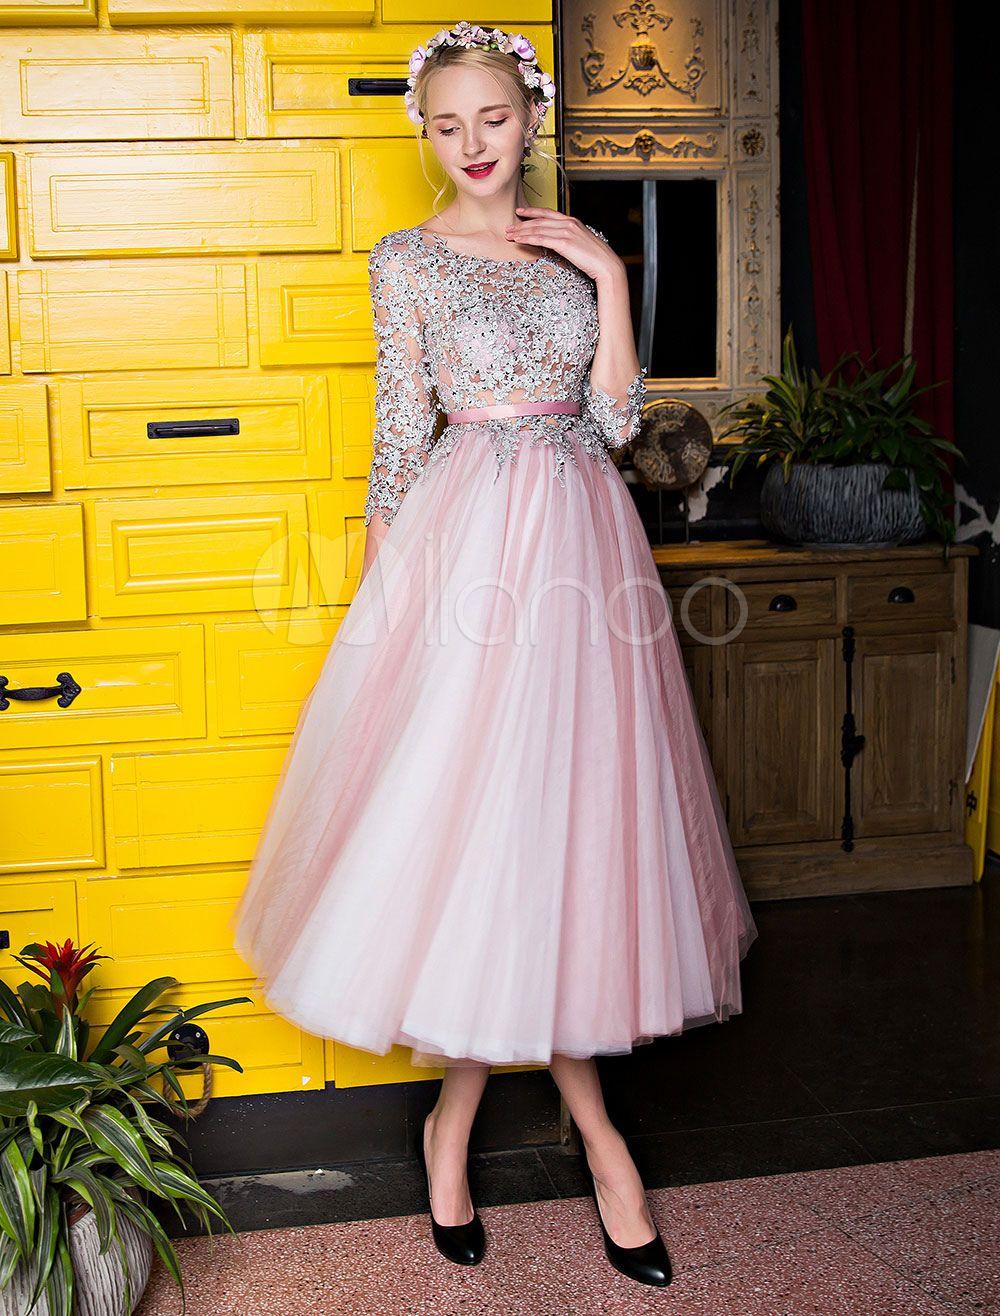 11637561837 Cameo Pink Prom Dresses Short Beading Tulle Half Sleeve Tea Length  Homecoming Dress - Milanoo.com